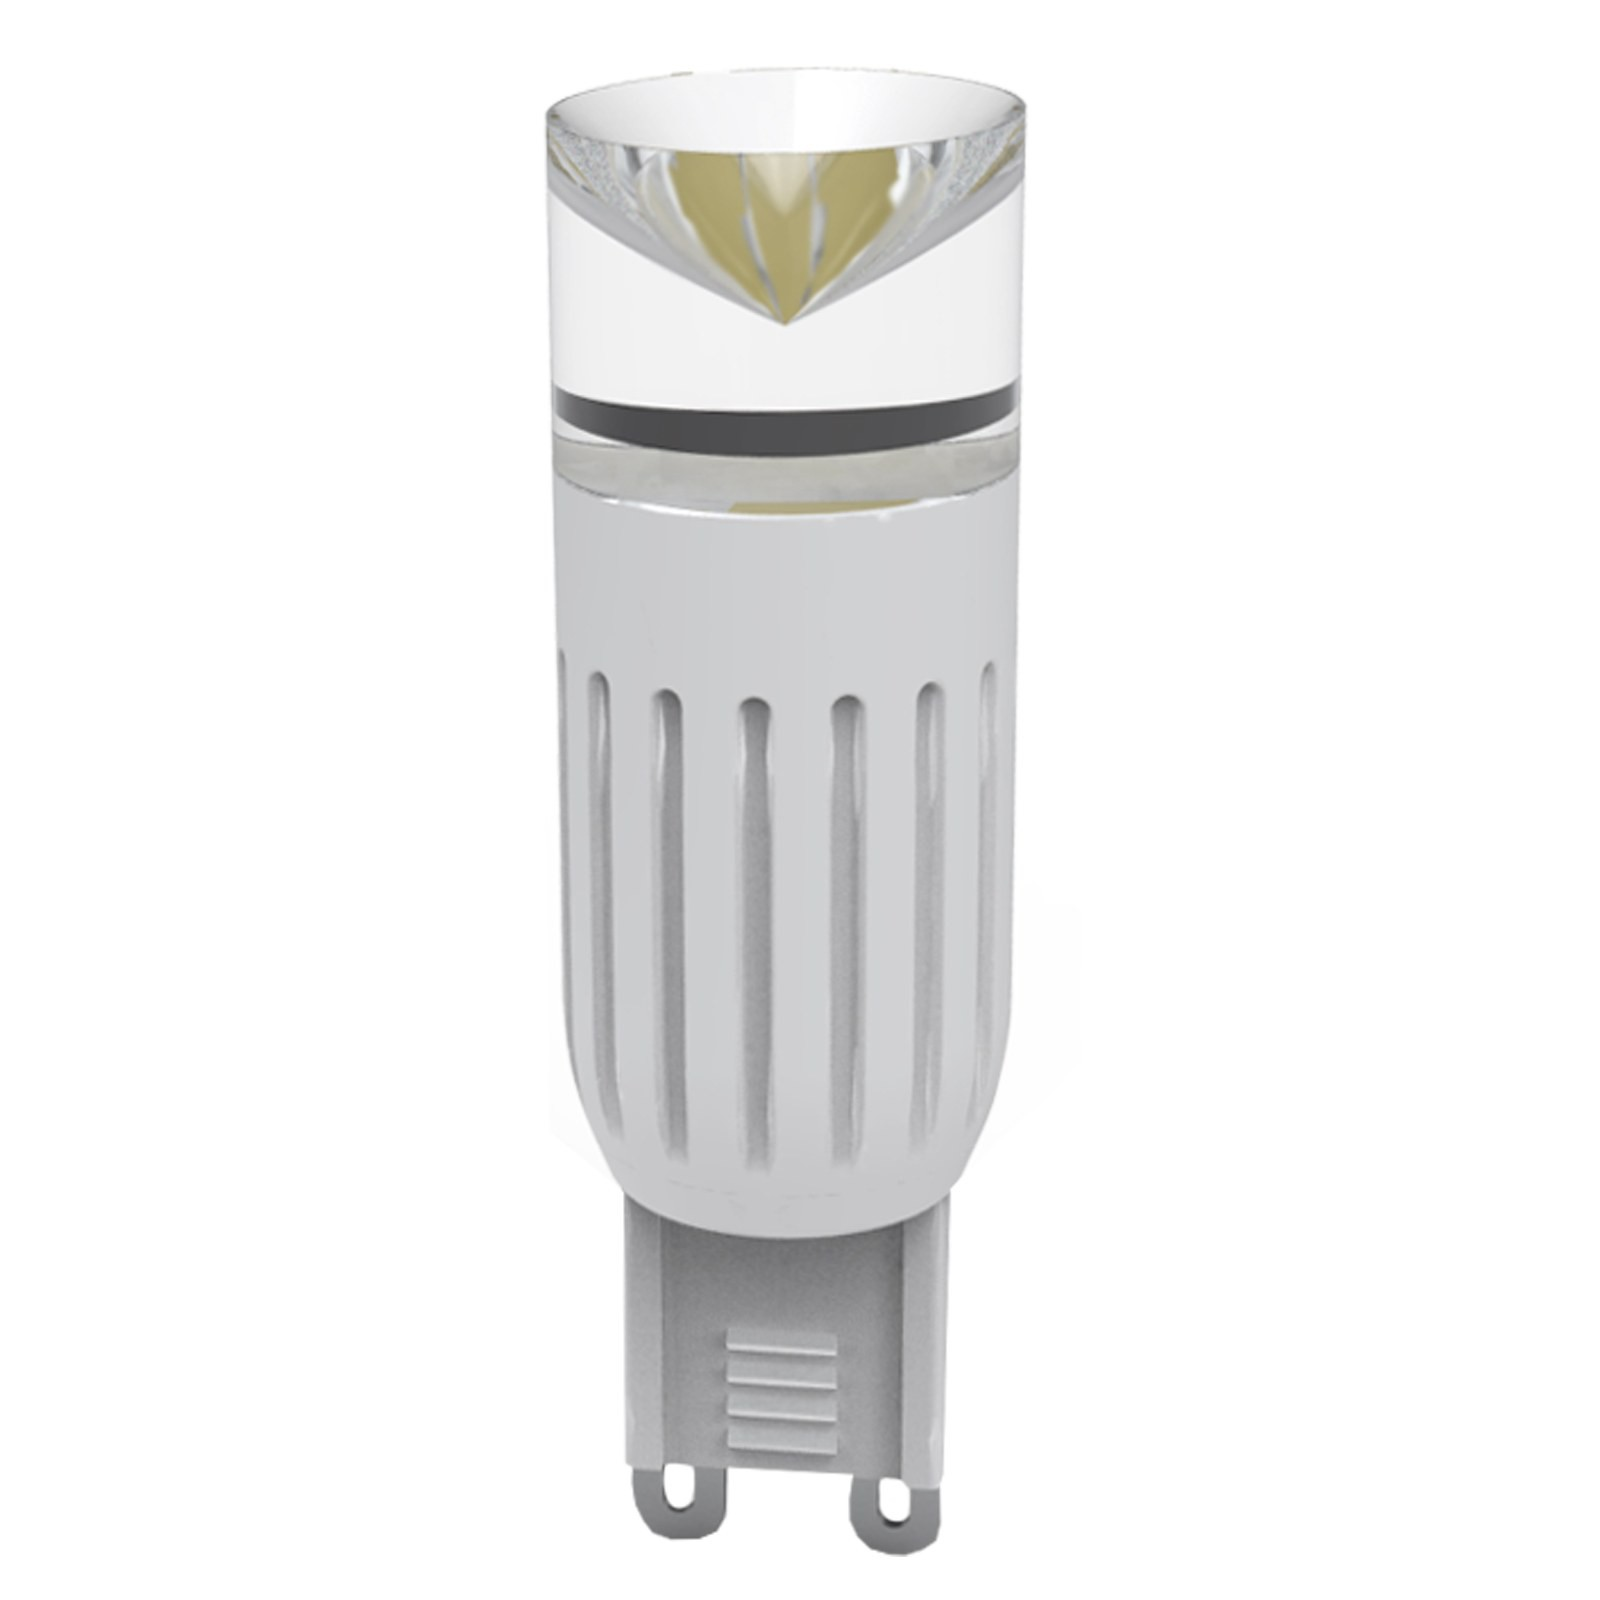 Lampada Led Lampadina Attacco G9 Luce Bianca Calda SMD LIGHT 3 Watt 170 Lumen - Area Illumina